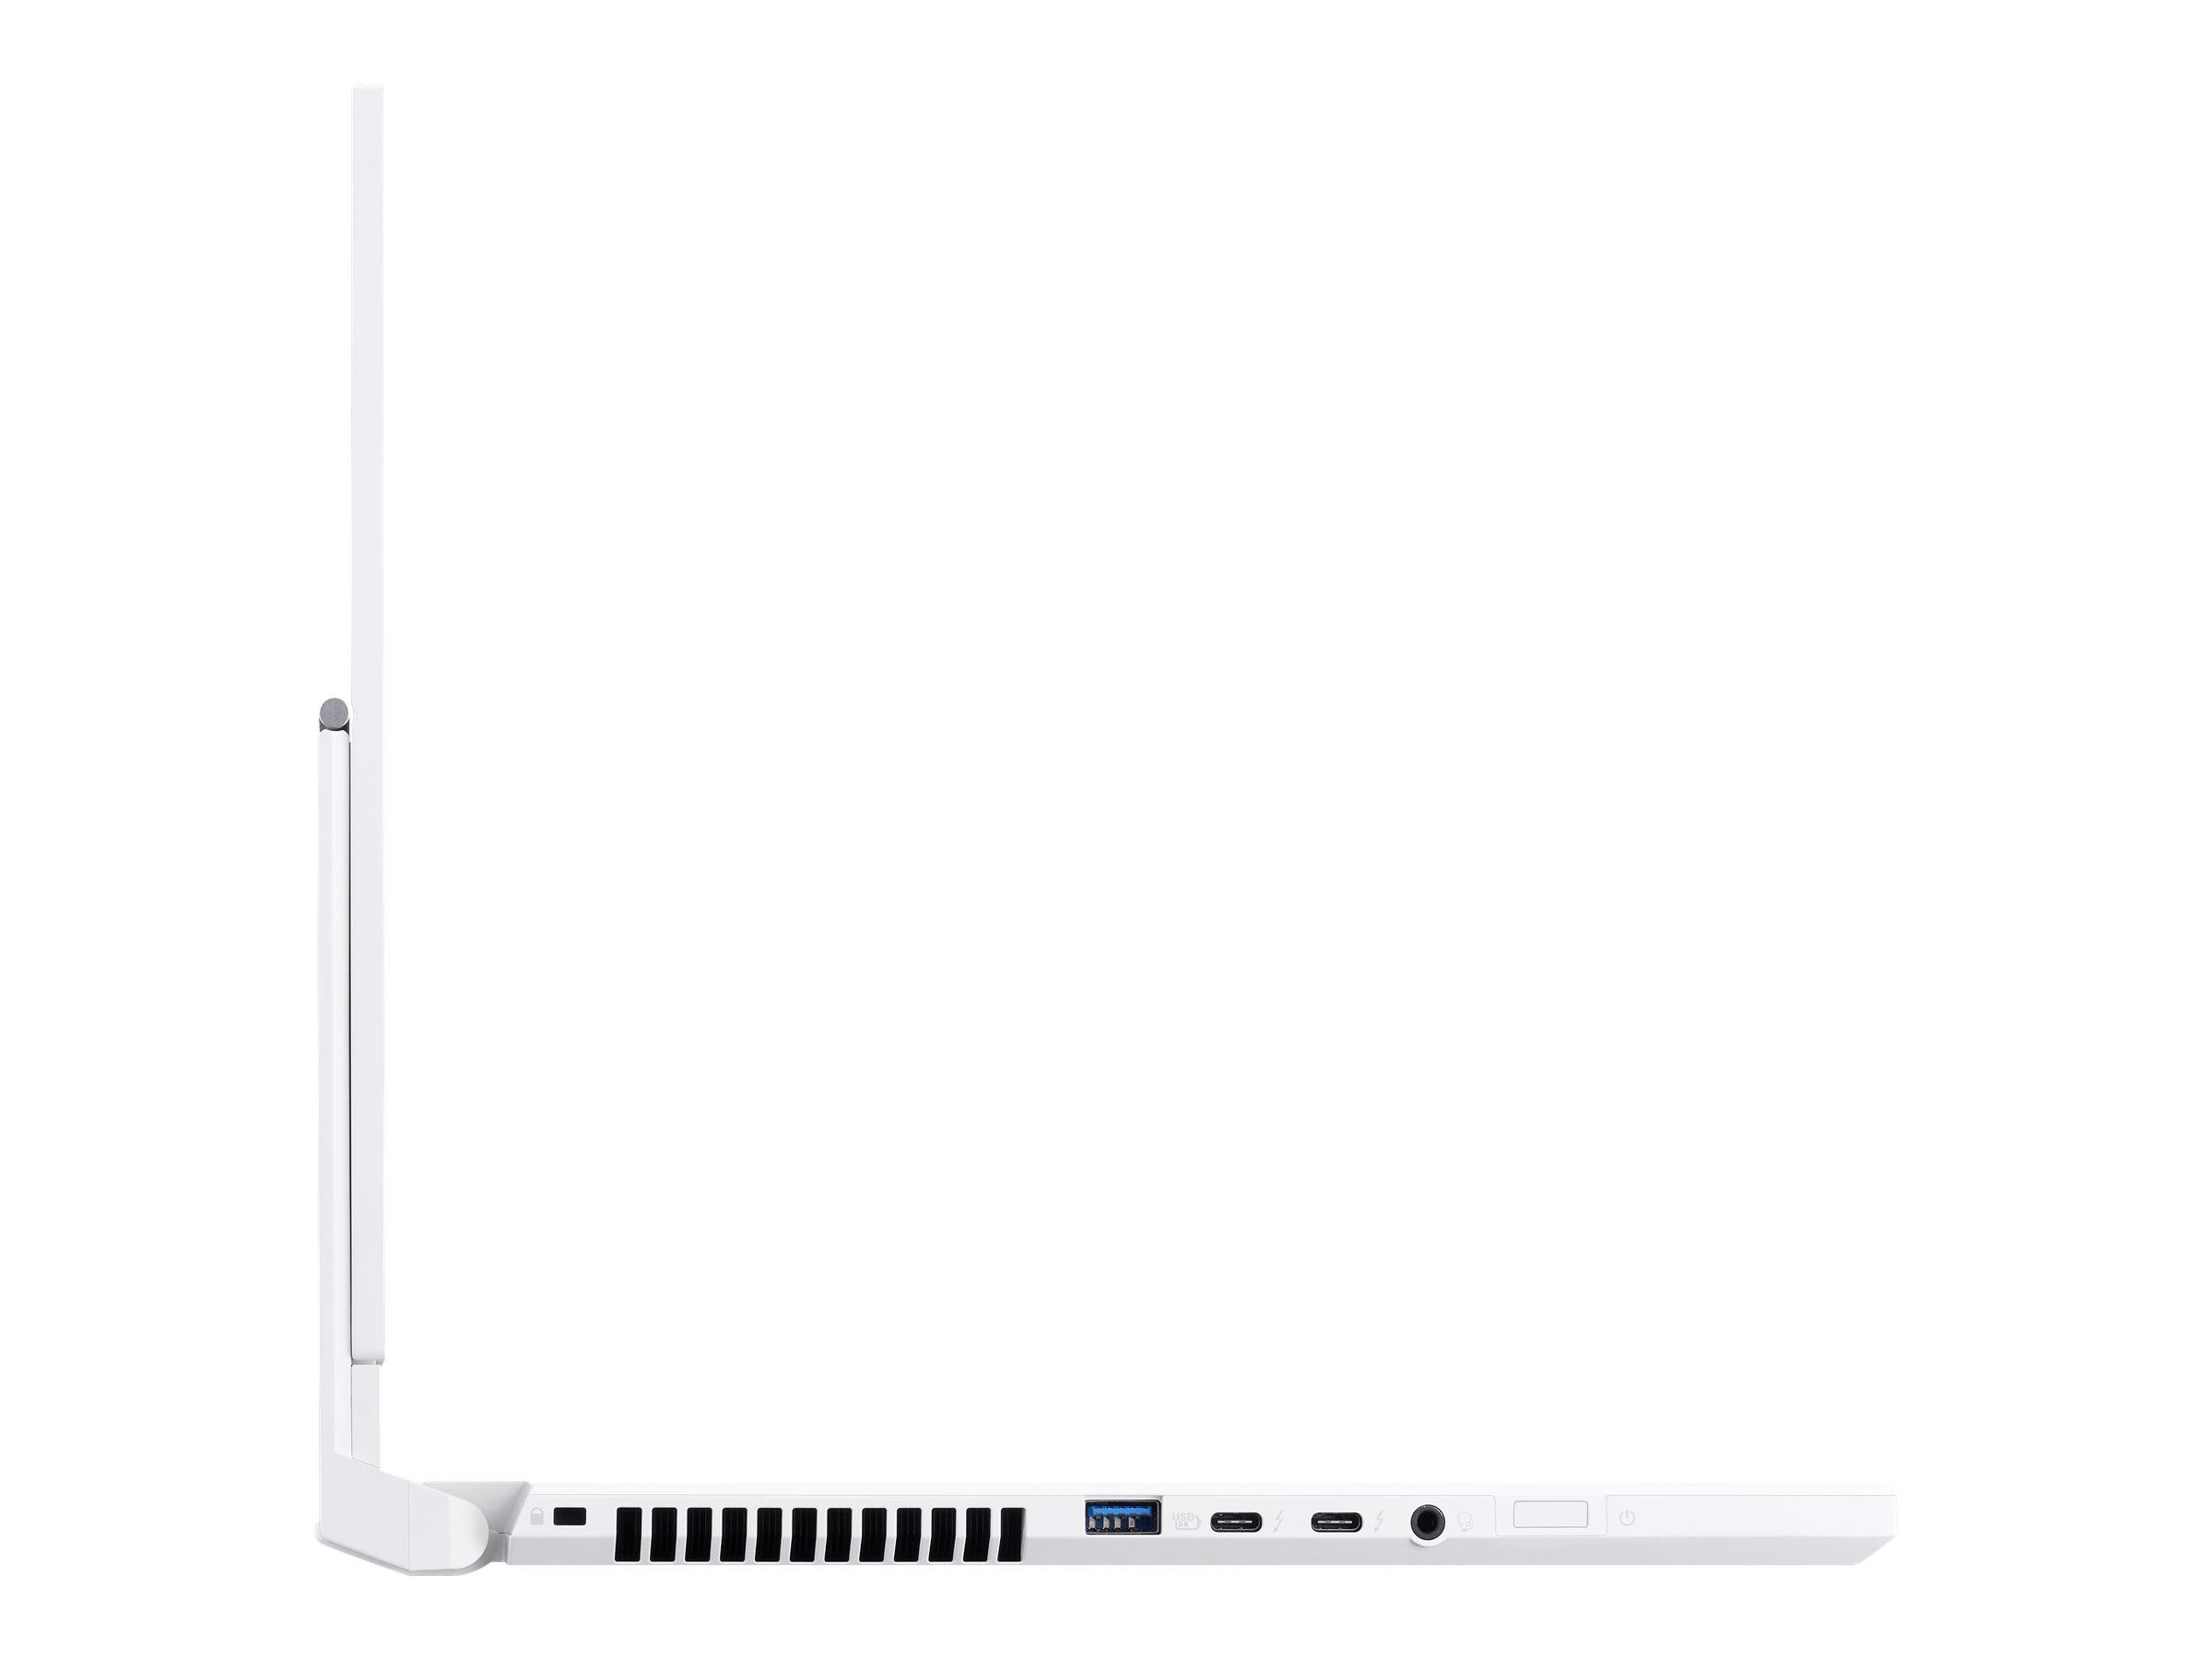 Acer ConceptD 7 Ezel Pro CC715-91P-X920 - Slider - Xeon W-10885M / 2.4 GHz - Win 10 Pro 64-Bit - 32 GB RAM - 1.024 TB (2x)